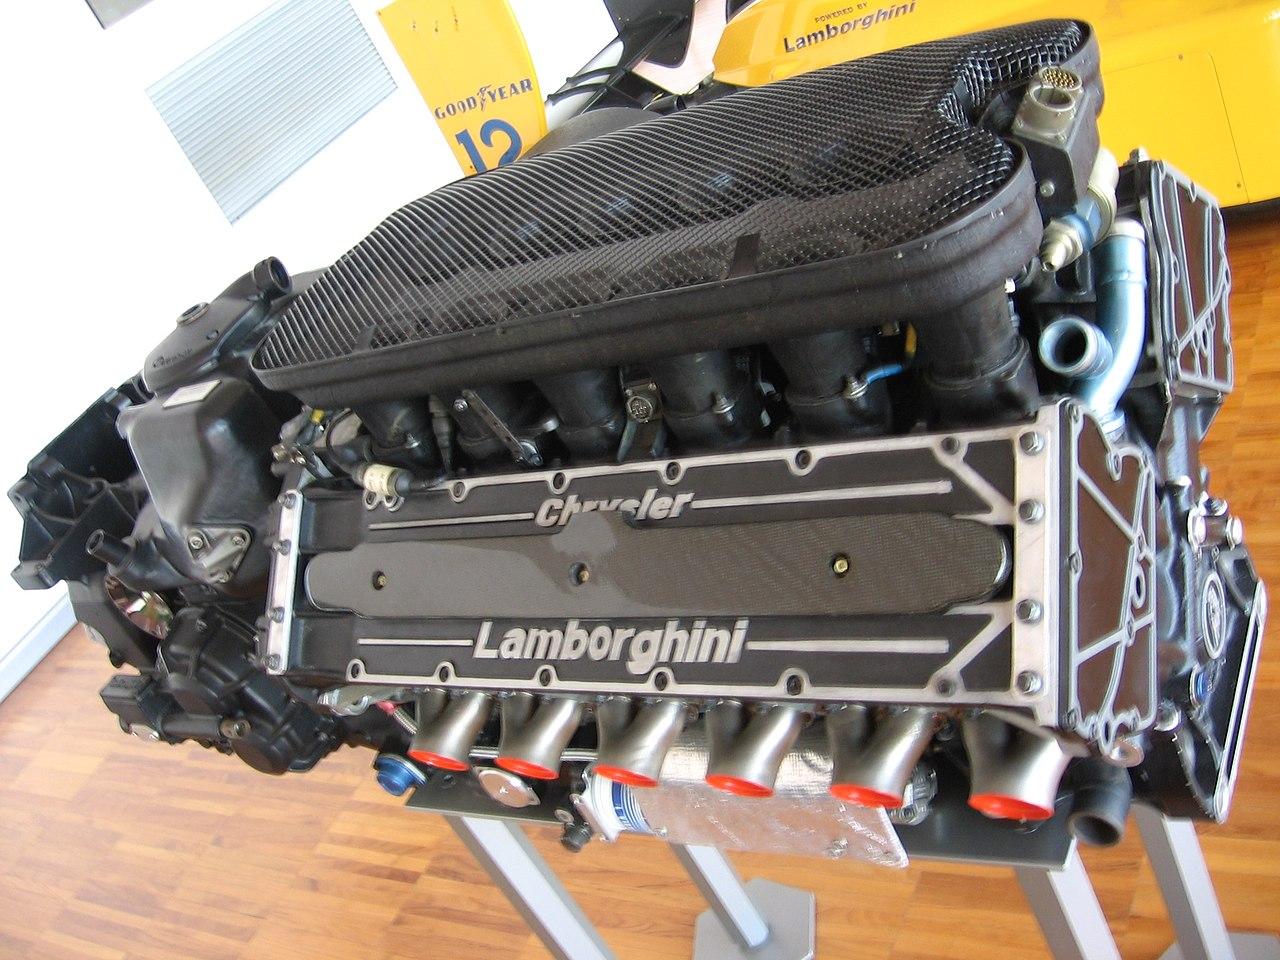 Lamborghini Engine Diagram Wiring Library Yamaha Harness Free Download Filelambo V12 F1